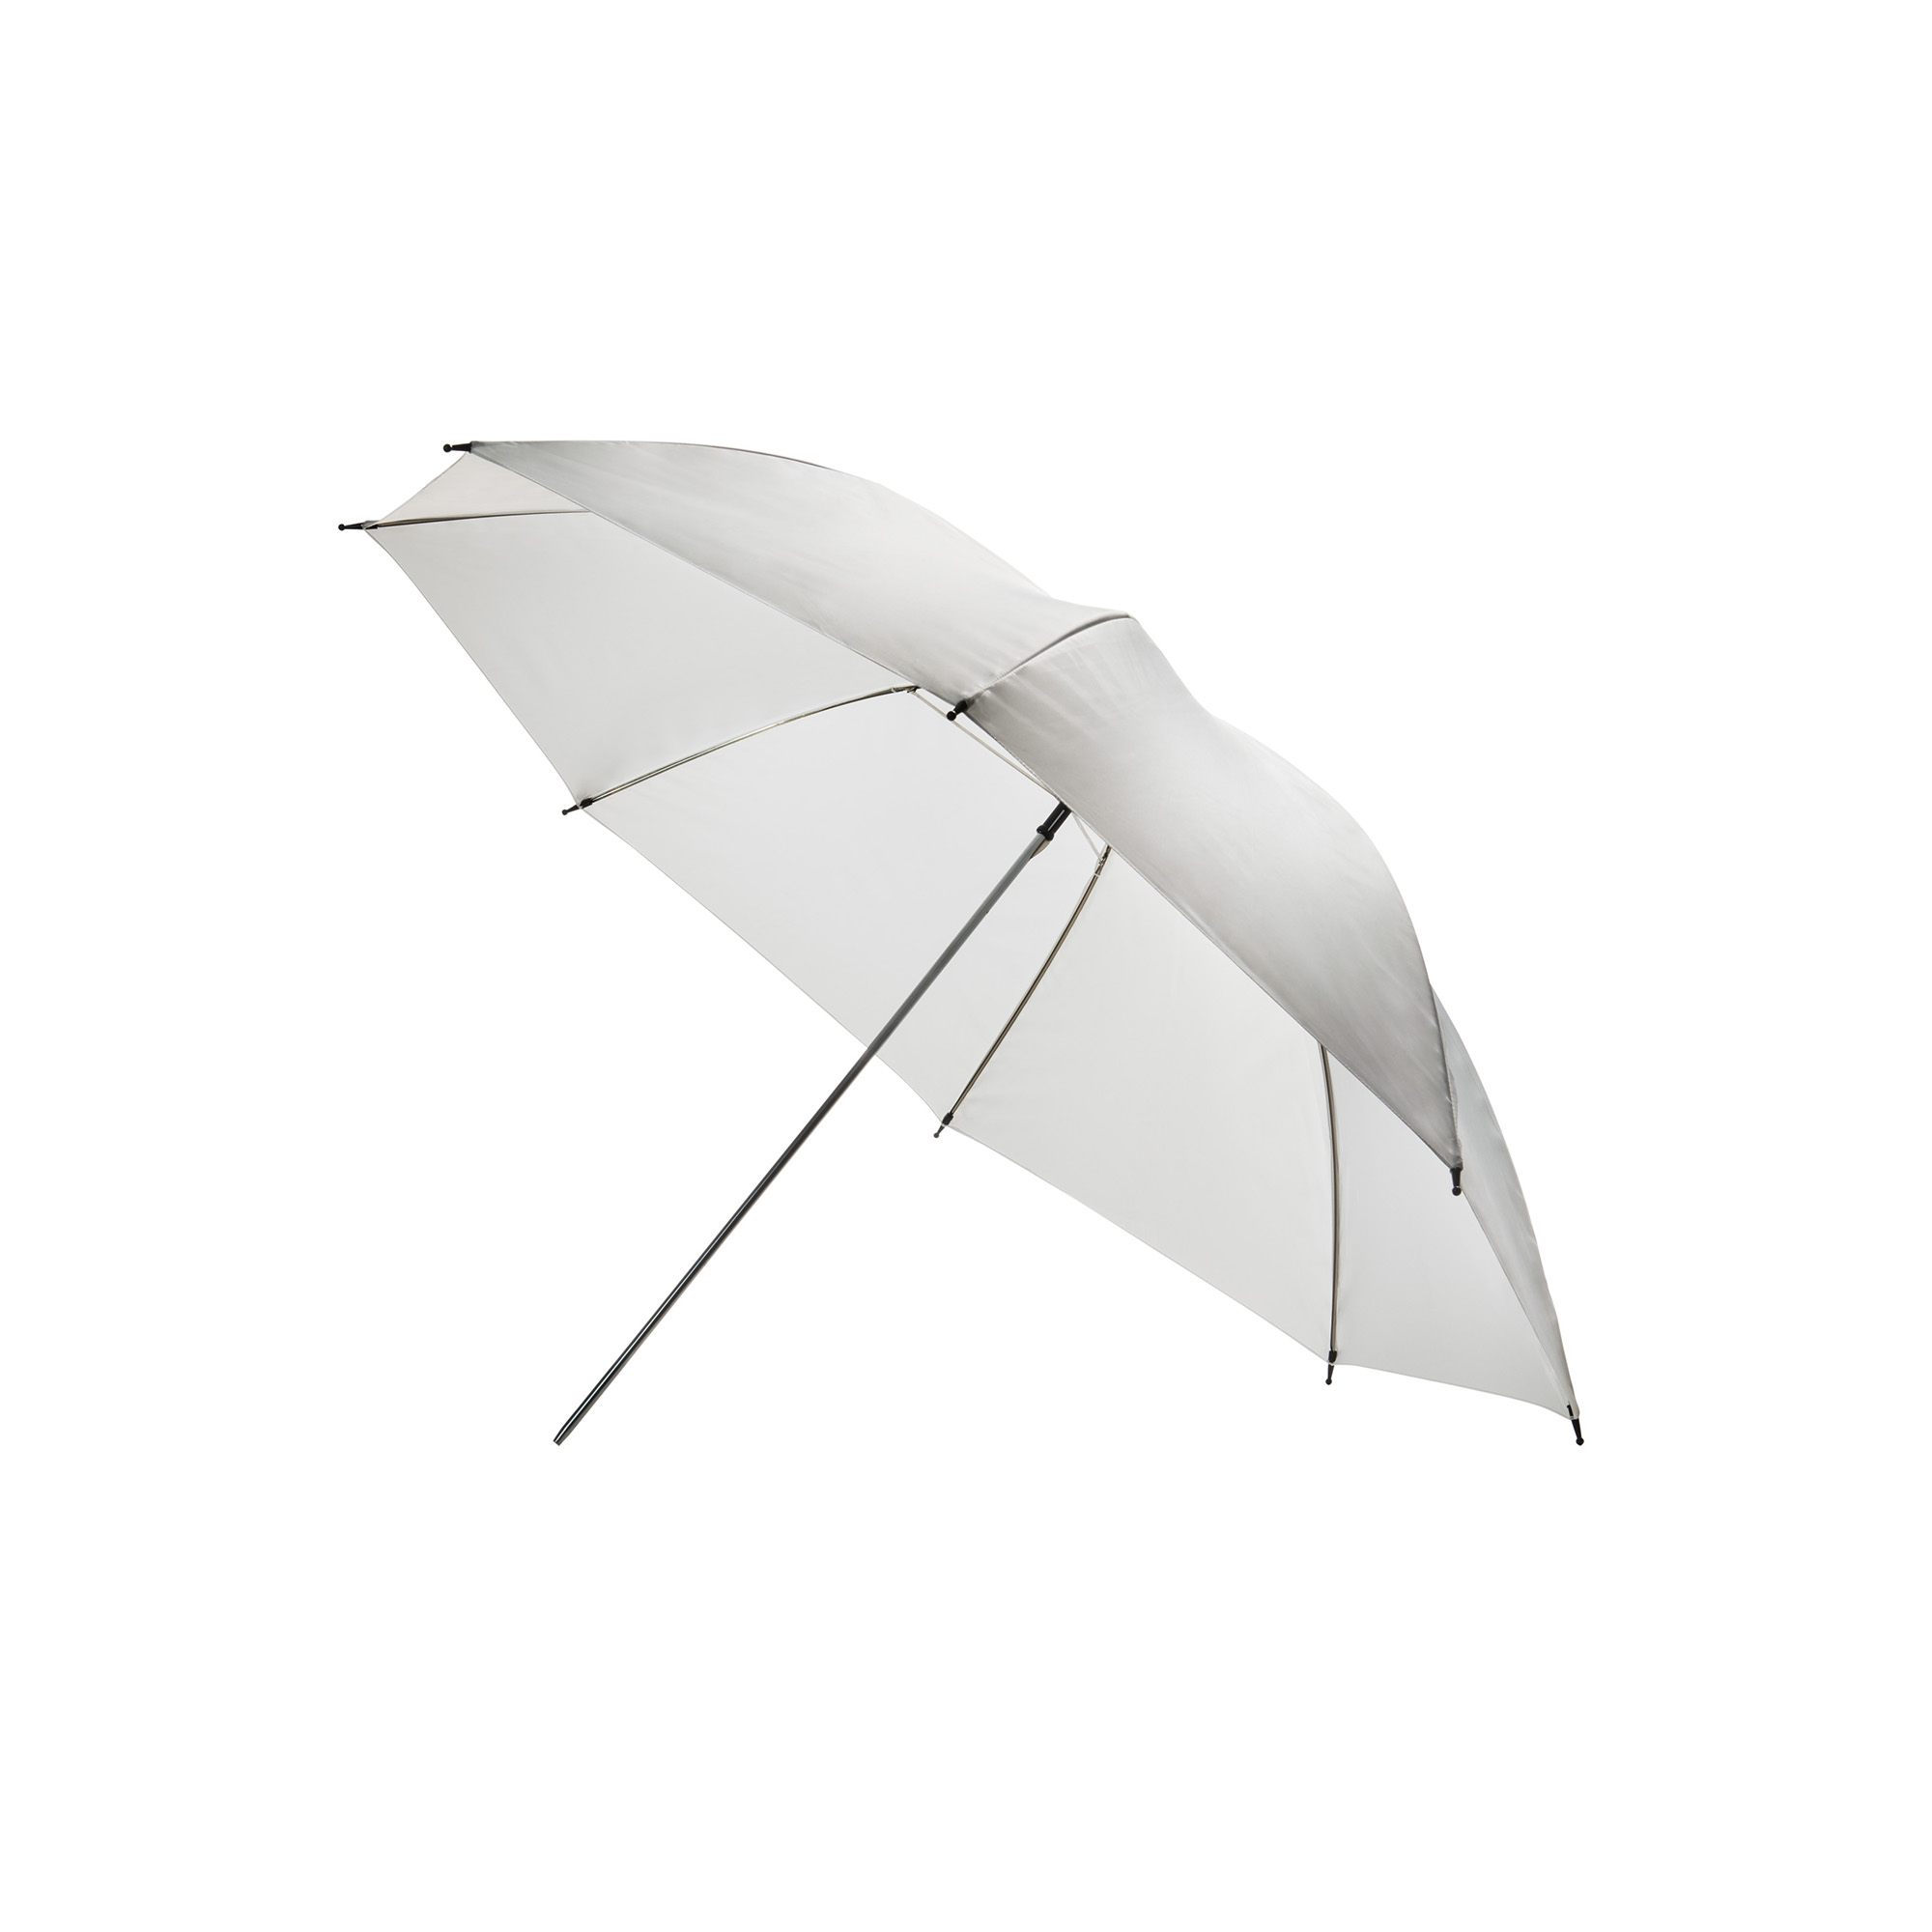 Broncolor Umbrella transparent 105 cm available to rent / verhuur / location at 50.8 Studio • Belgïe, Belgique, Belgium, Broncolor, Huur, Location, Louer, Photo, Rent, Rental, Softbox, Strobe, Studio, Verhuur, Video